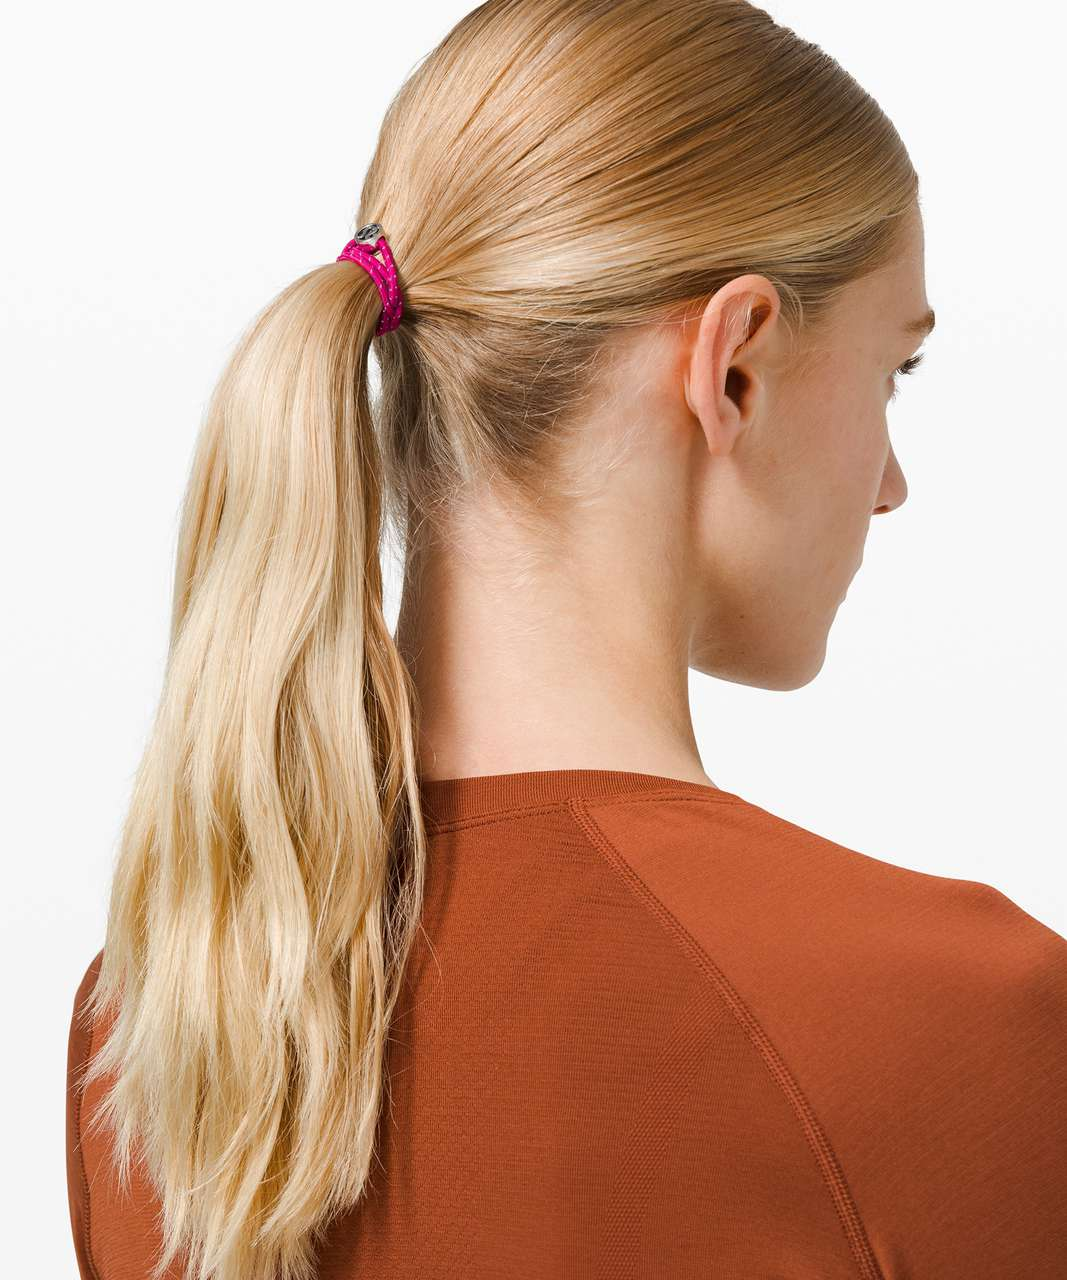 Lululemon Glow On Hair Ties - Yellow Pear / Rosemary Green / Ripened Raspberry